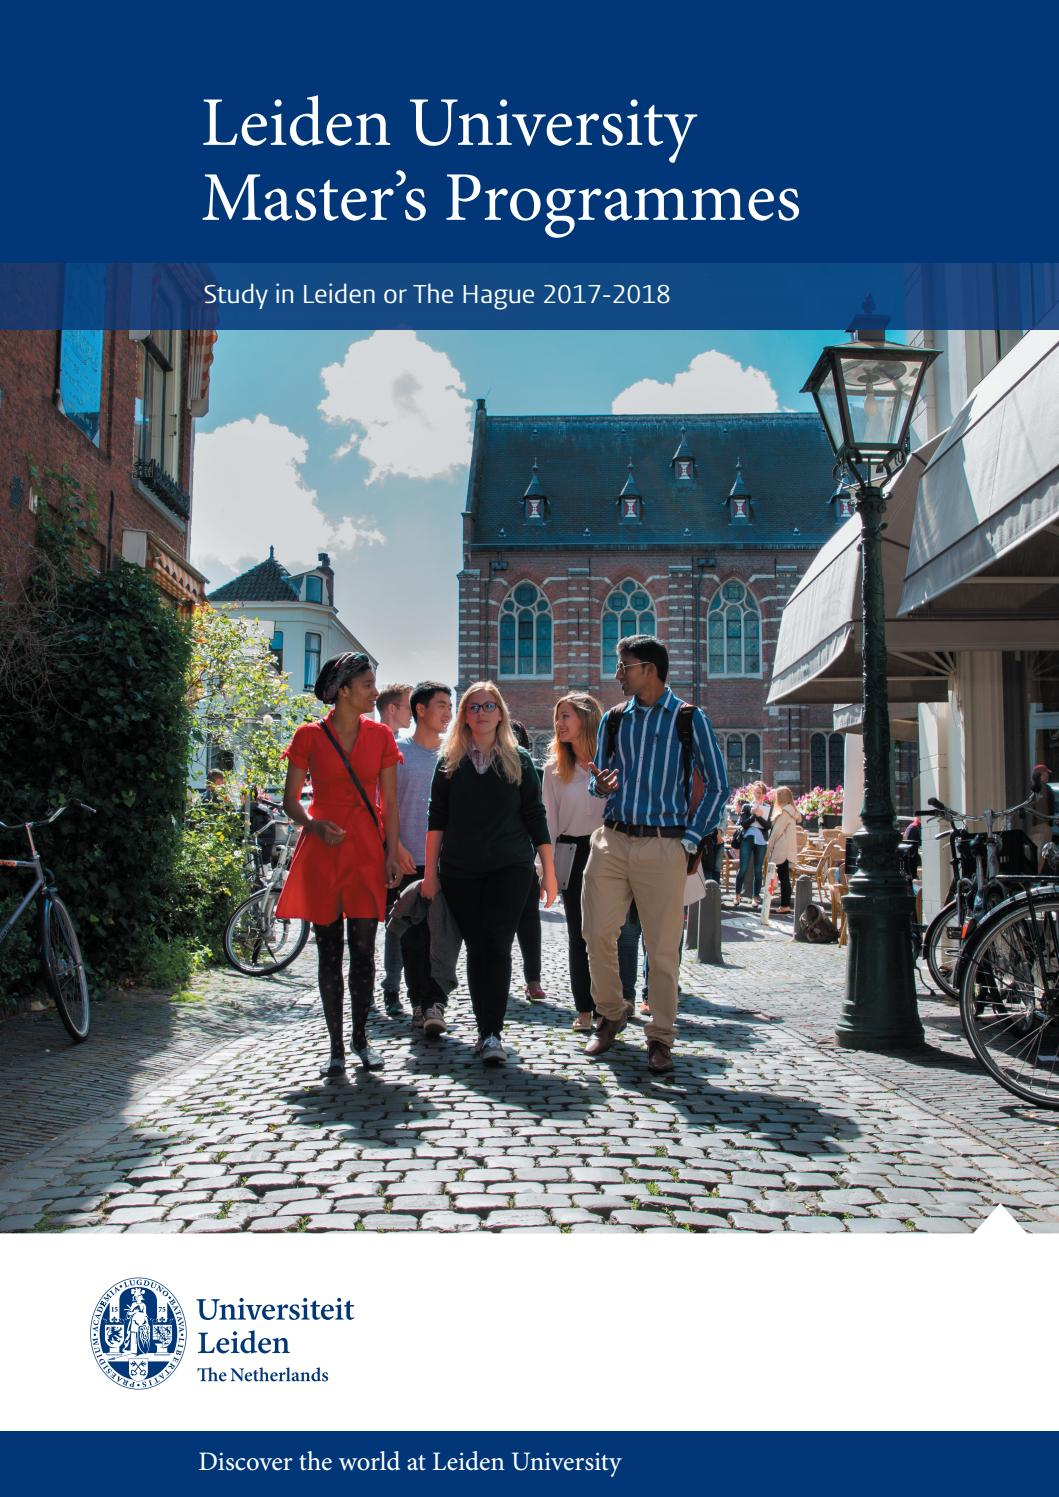 Albert Einstein Education >> Leiden University master's brochure by Universiteit Leiden ...